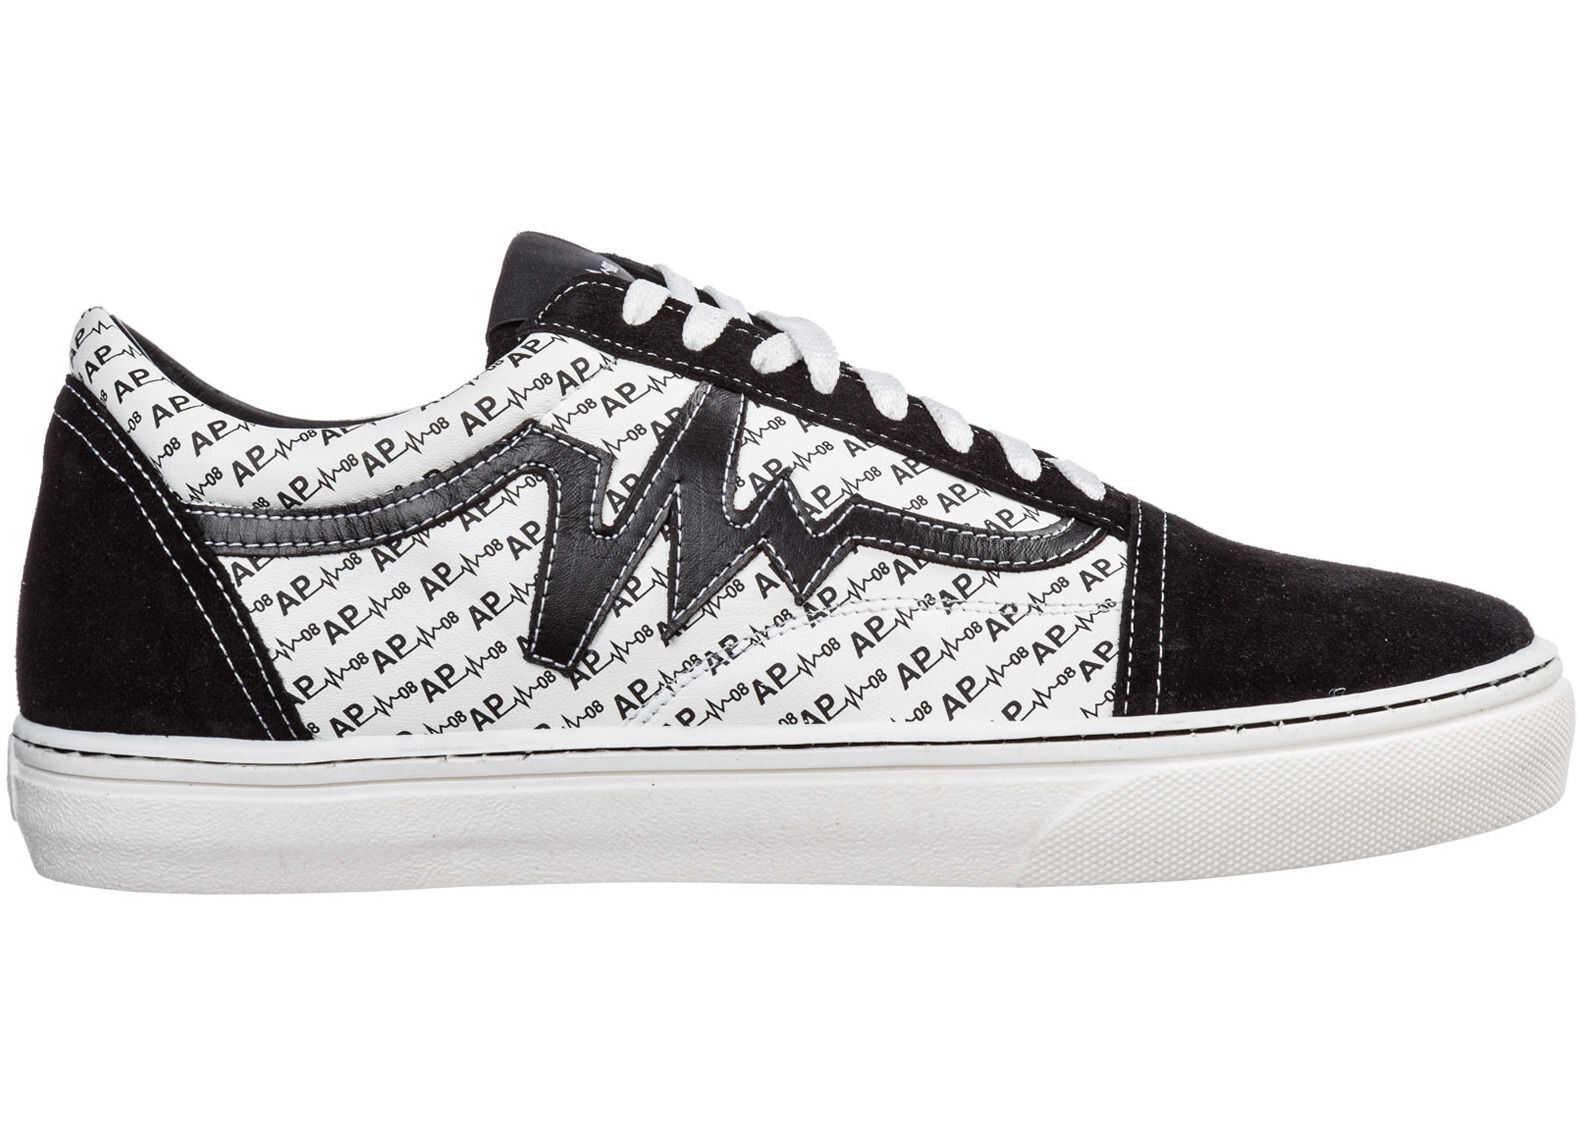 AP08 Sneakers Monogram White